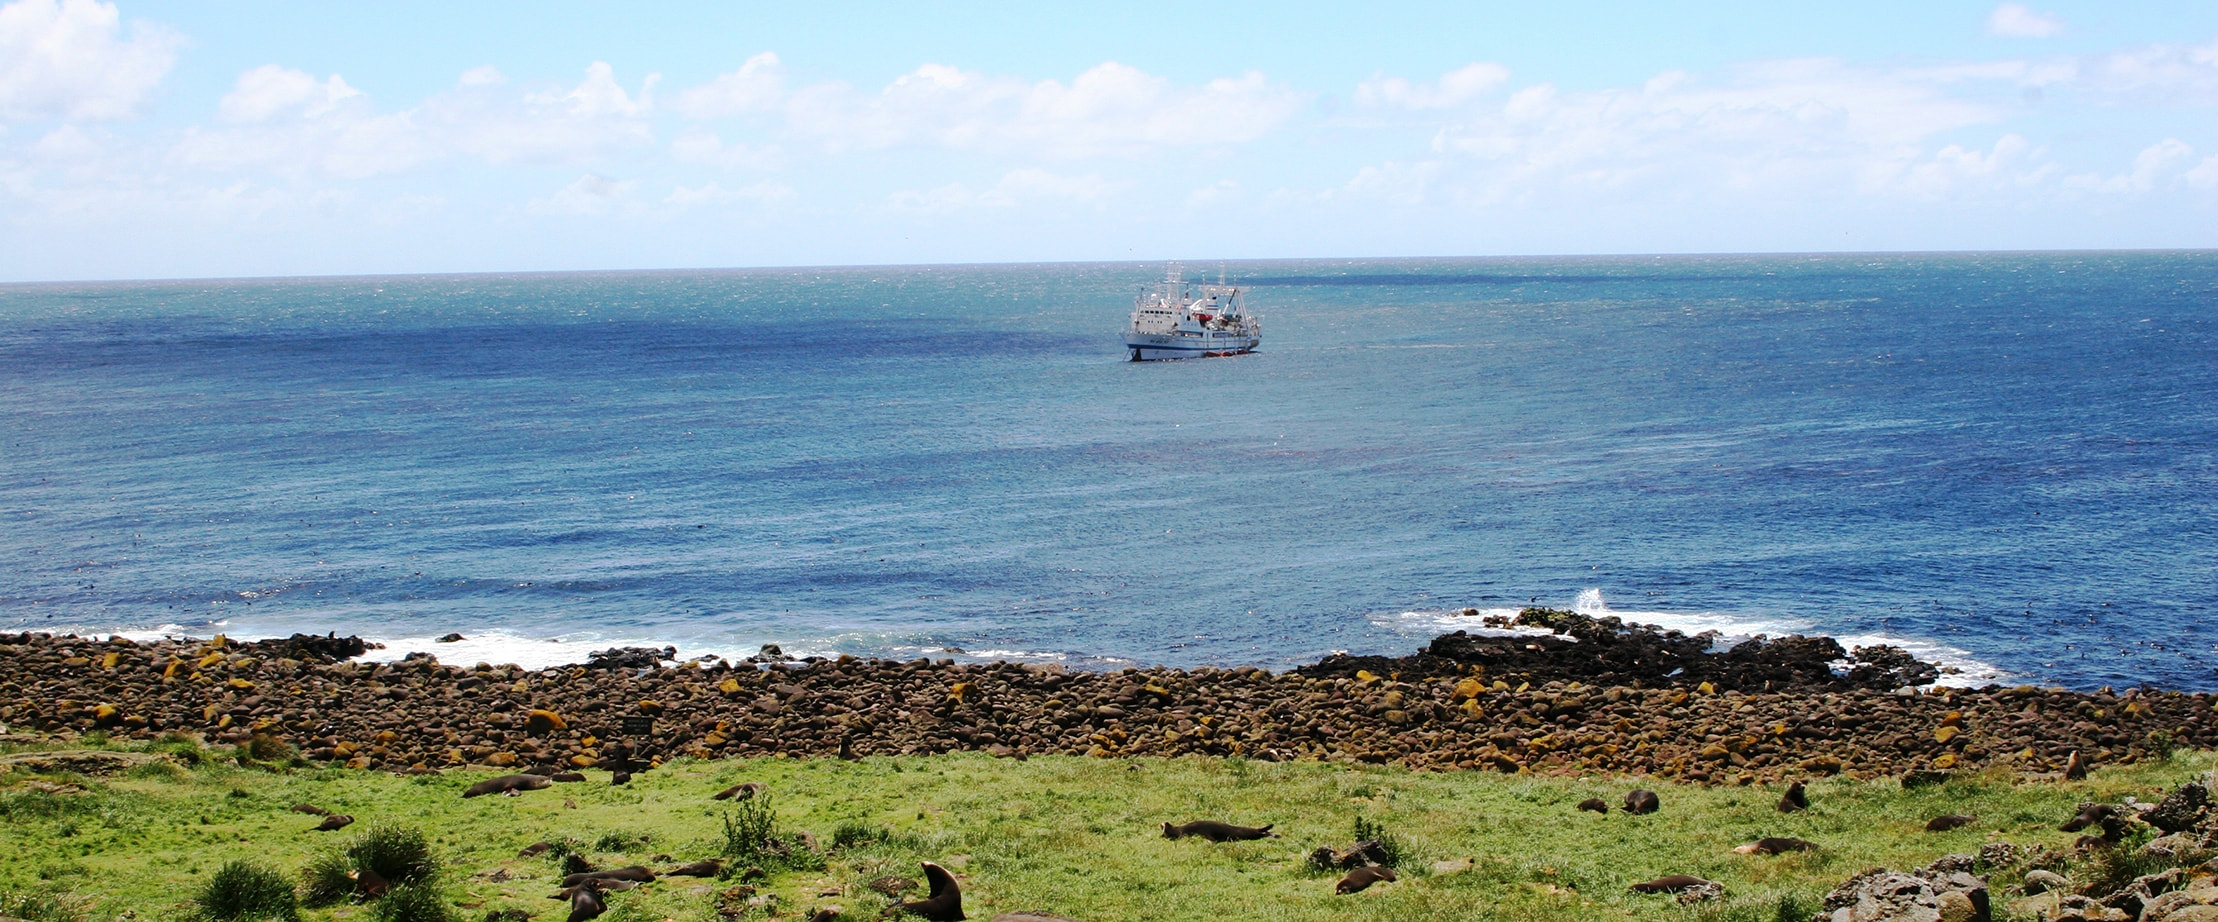 Paysage rivage navire SAPMER